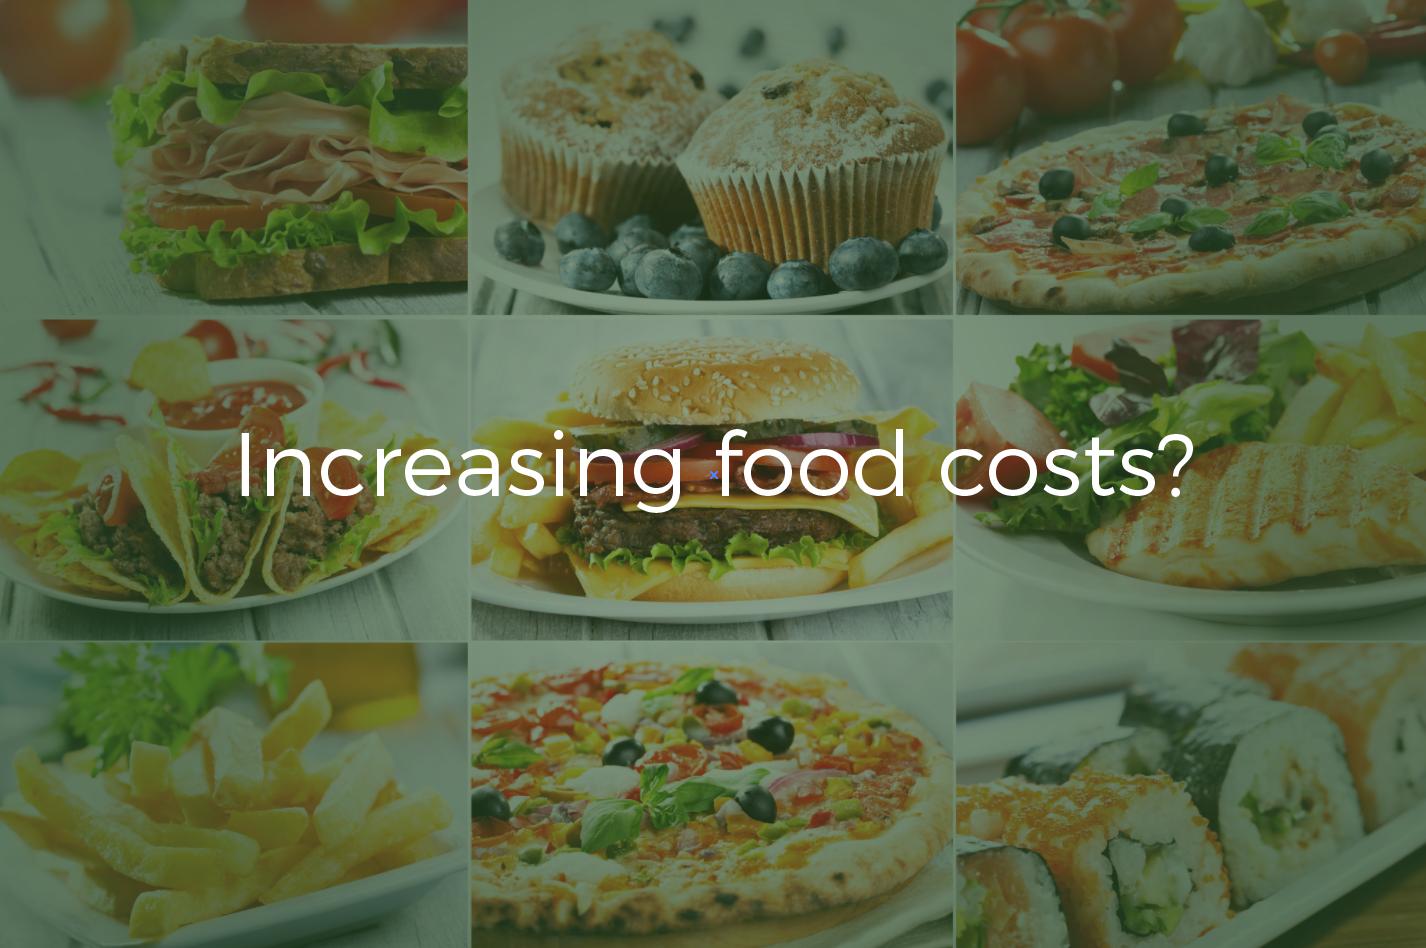 Increasing food costs